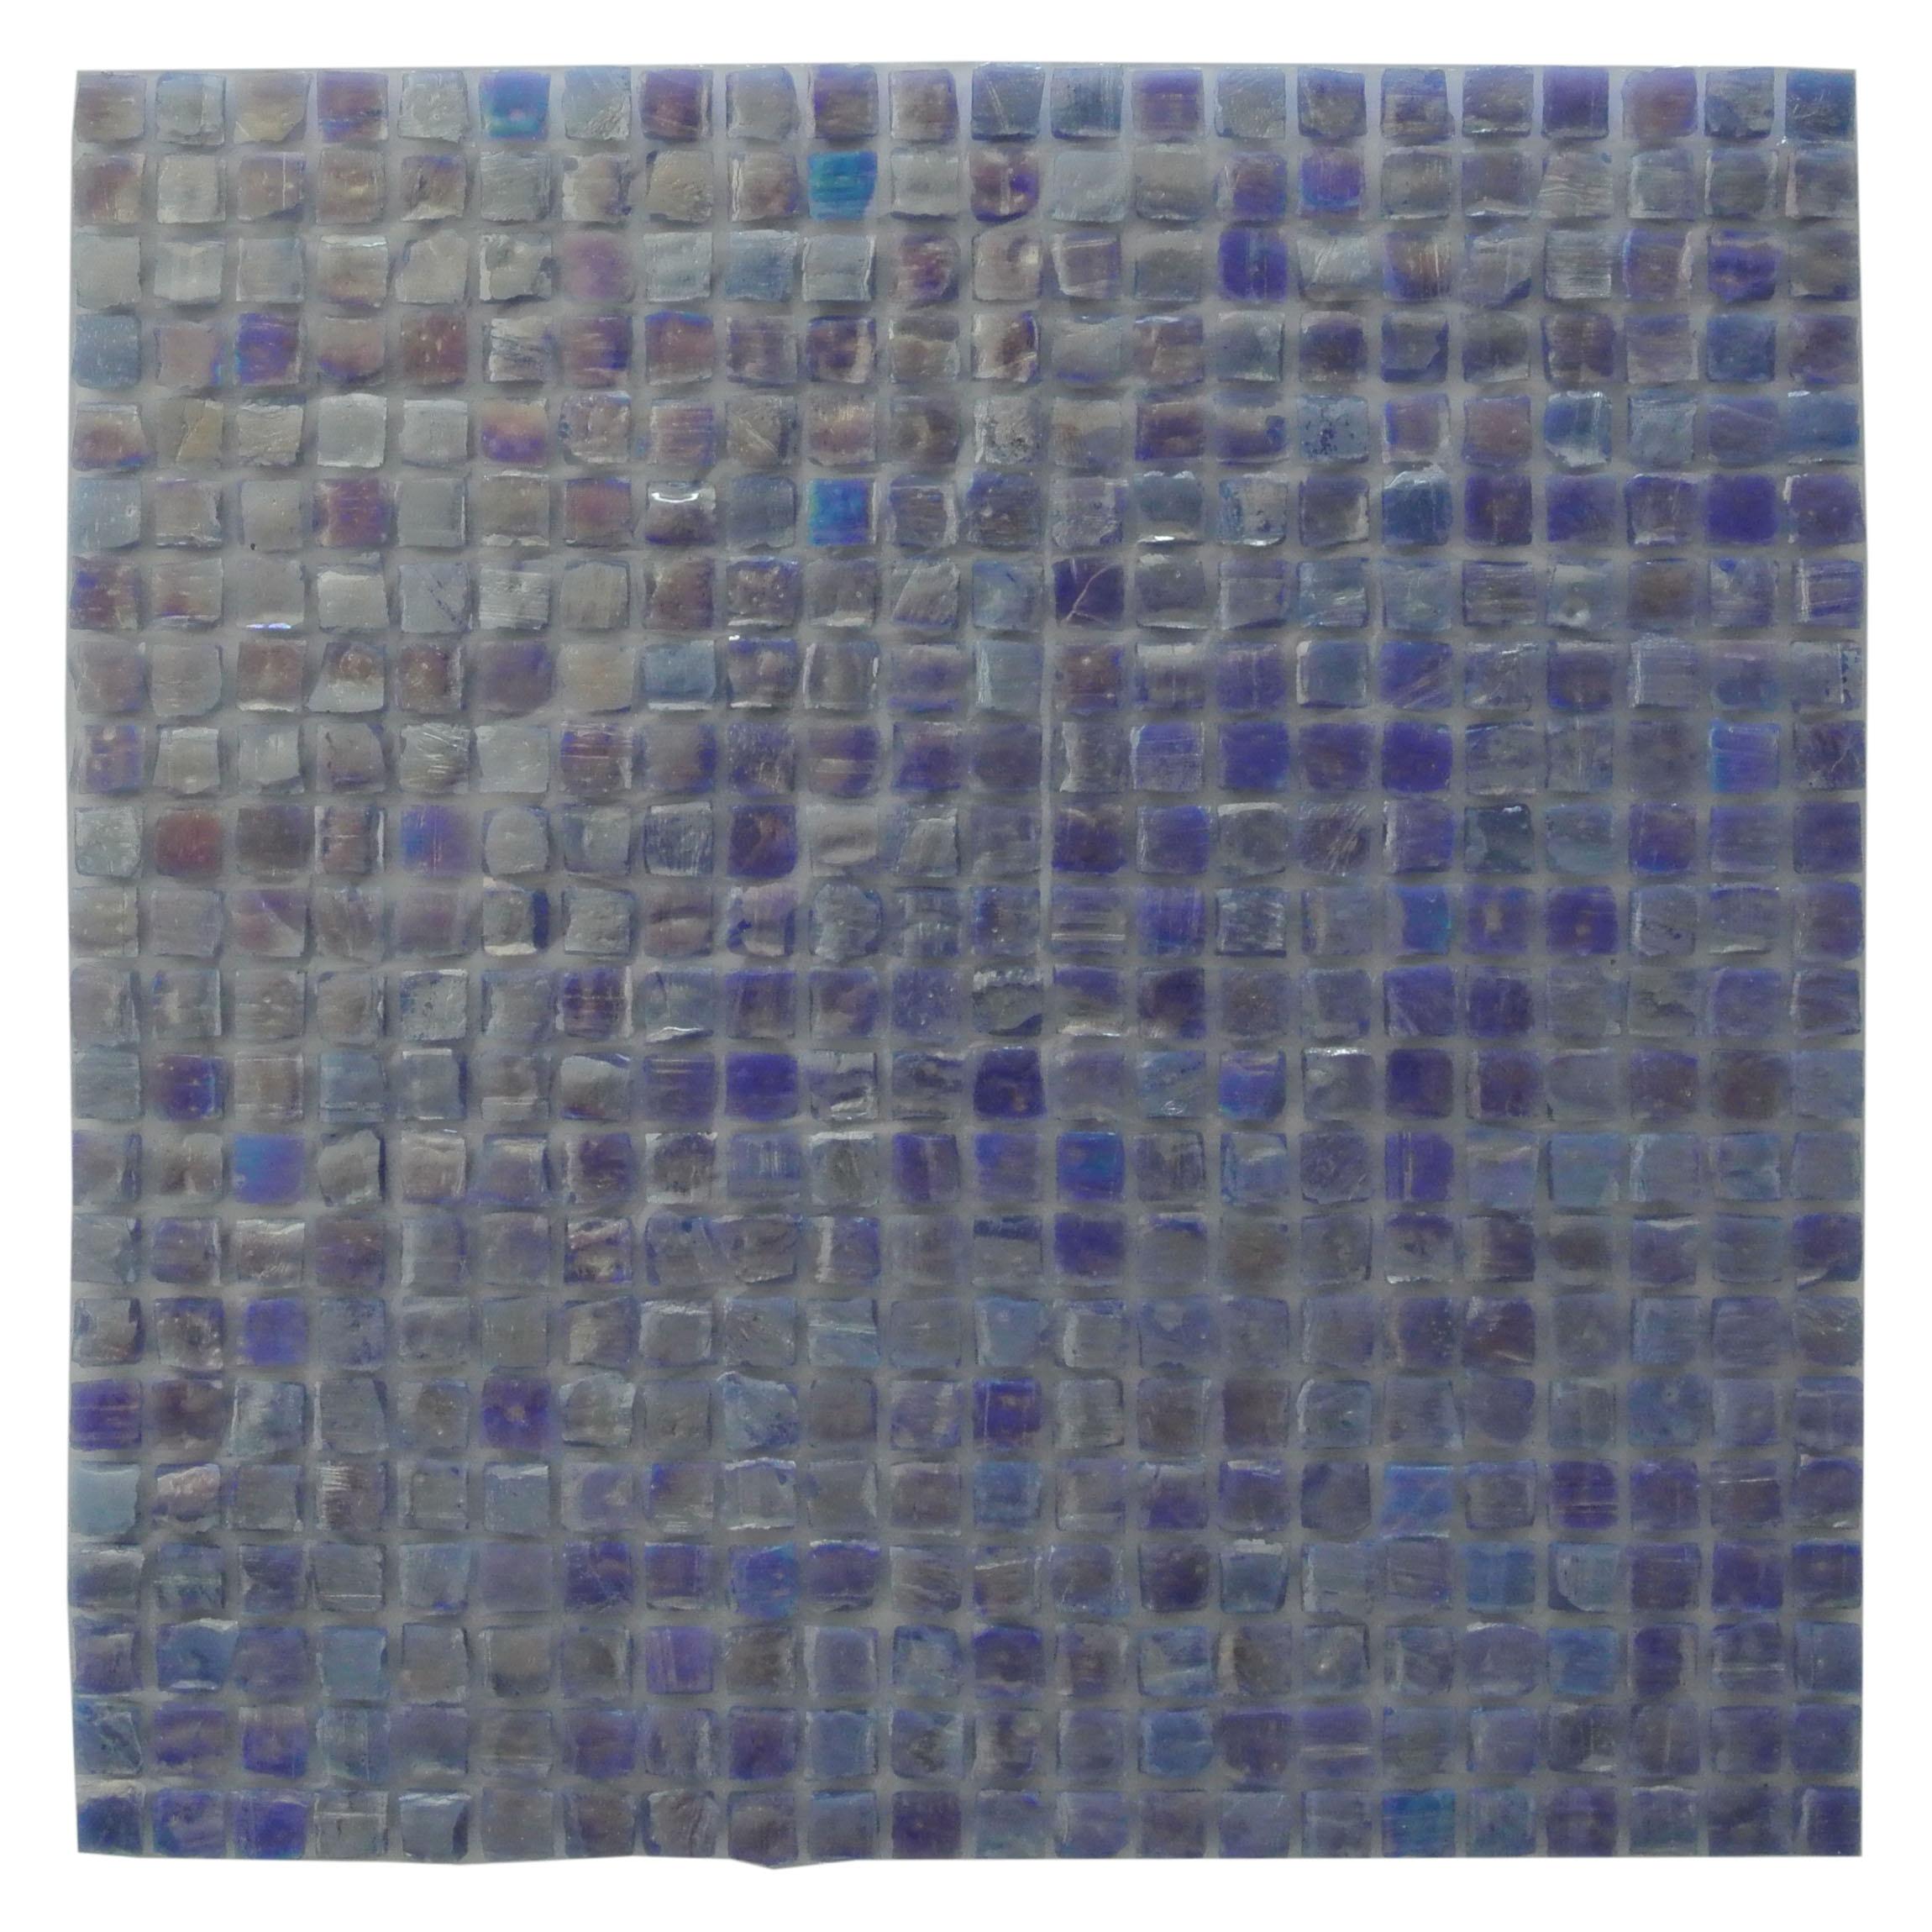 "Ecologic 0.375"" x 0.375"" Glossy Purple Glass Square Backsplash Mosaic Wall Tile"